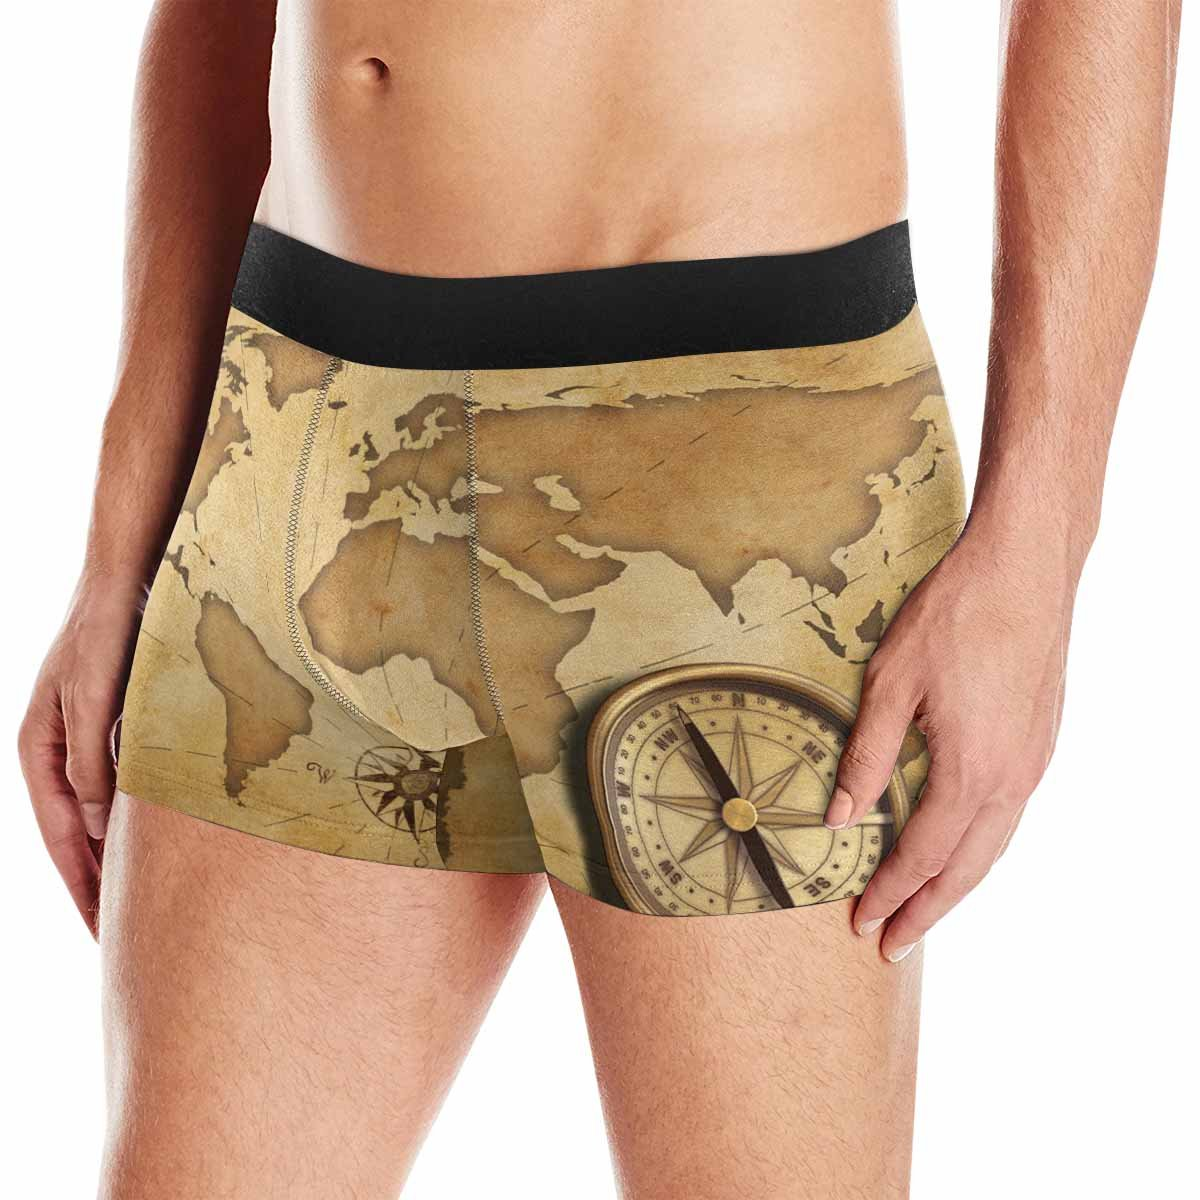 XS-3XL INTERESTPRINT Mens Boxer Briefs Underwear Aged Brass Antique Nautical Pocket Compass with Old Map